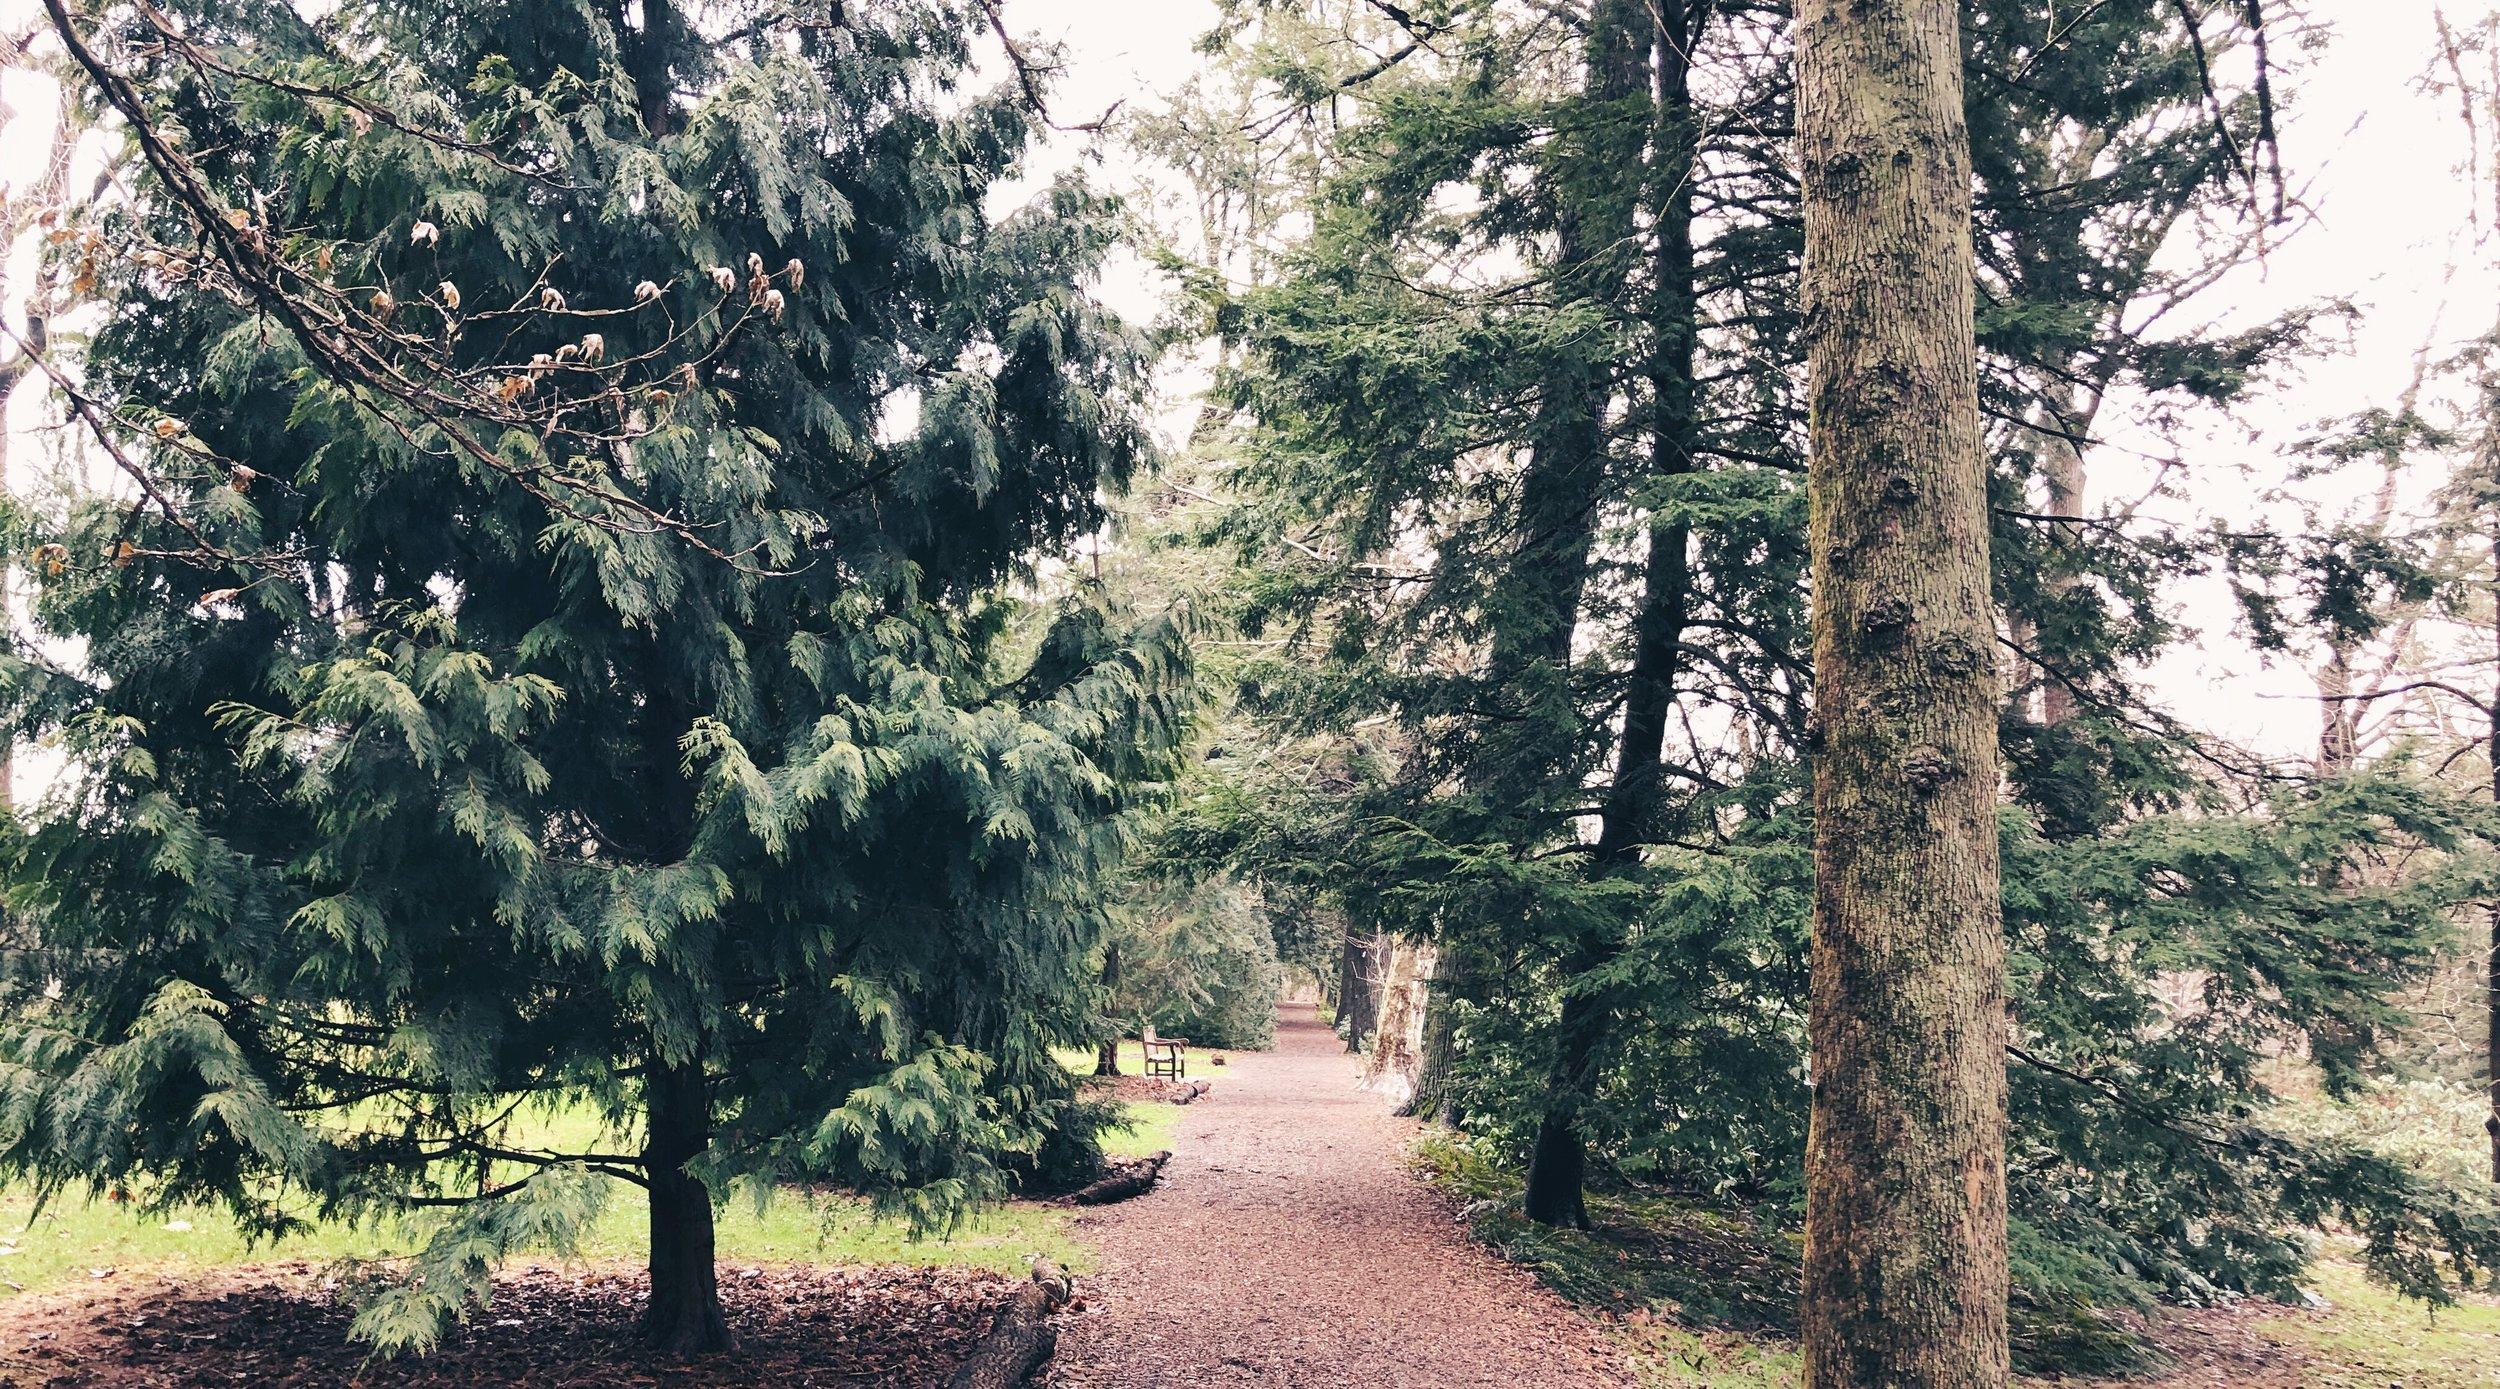 longwood-gardens-forest-nora-knox.jpeg